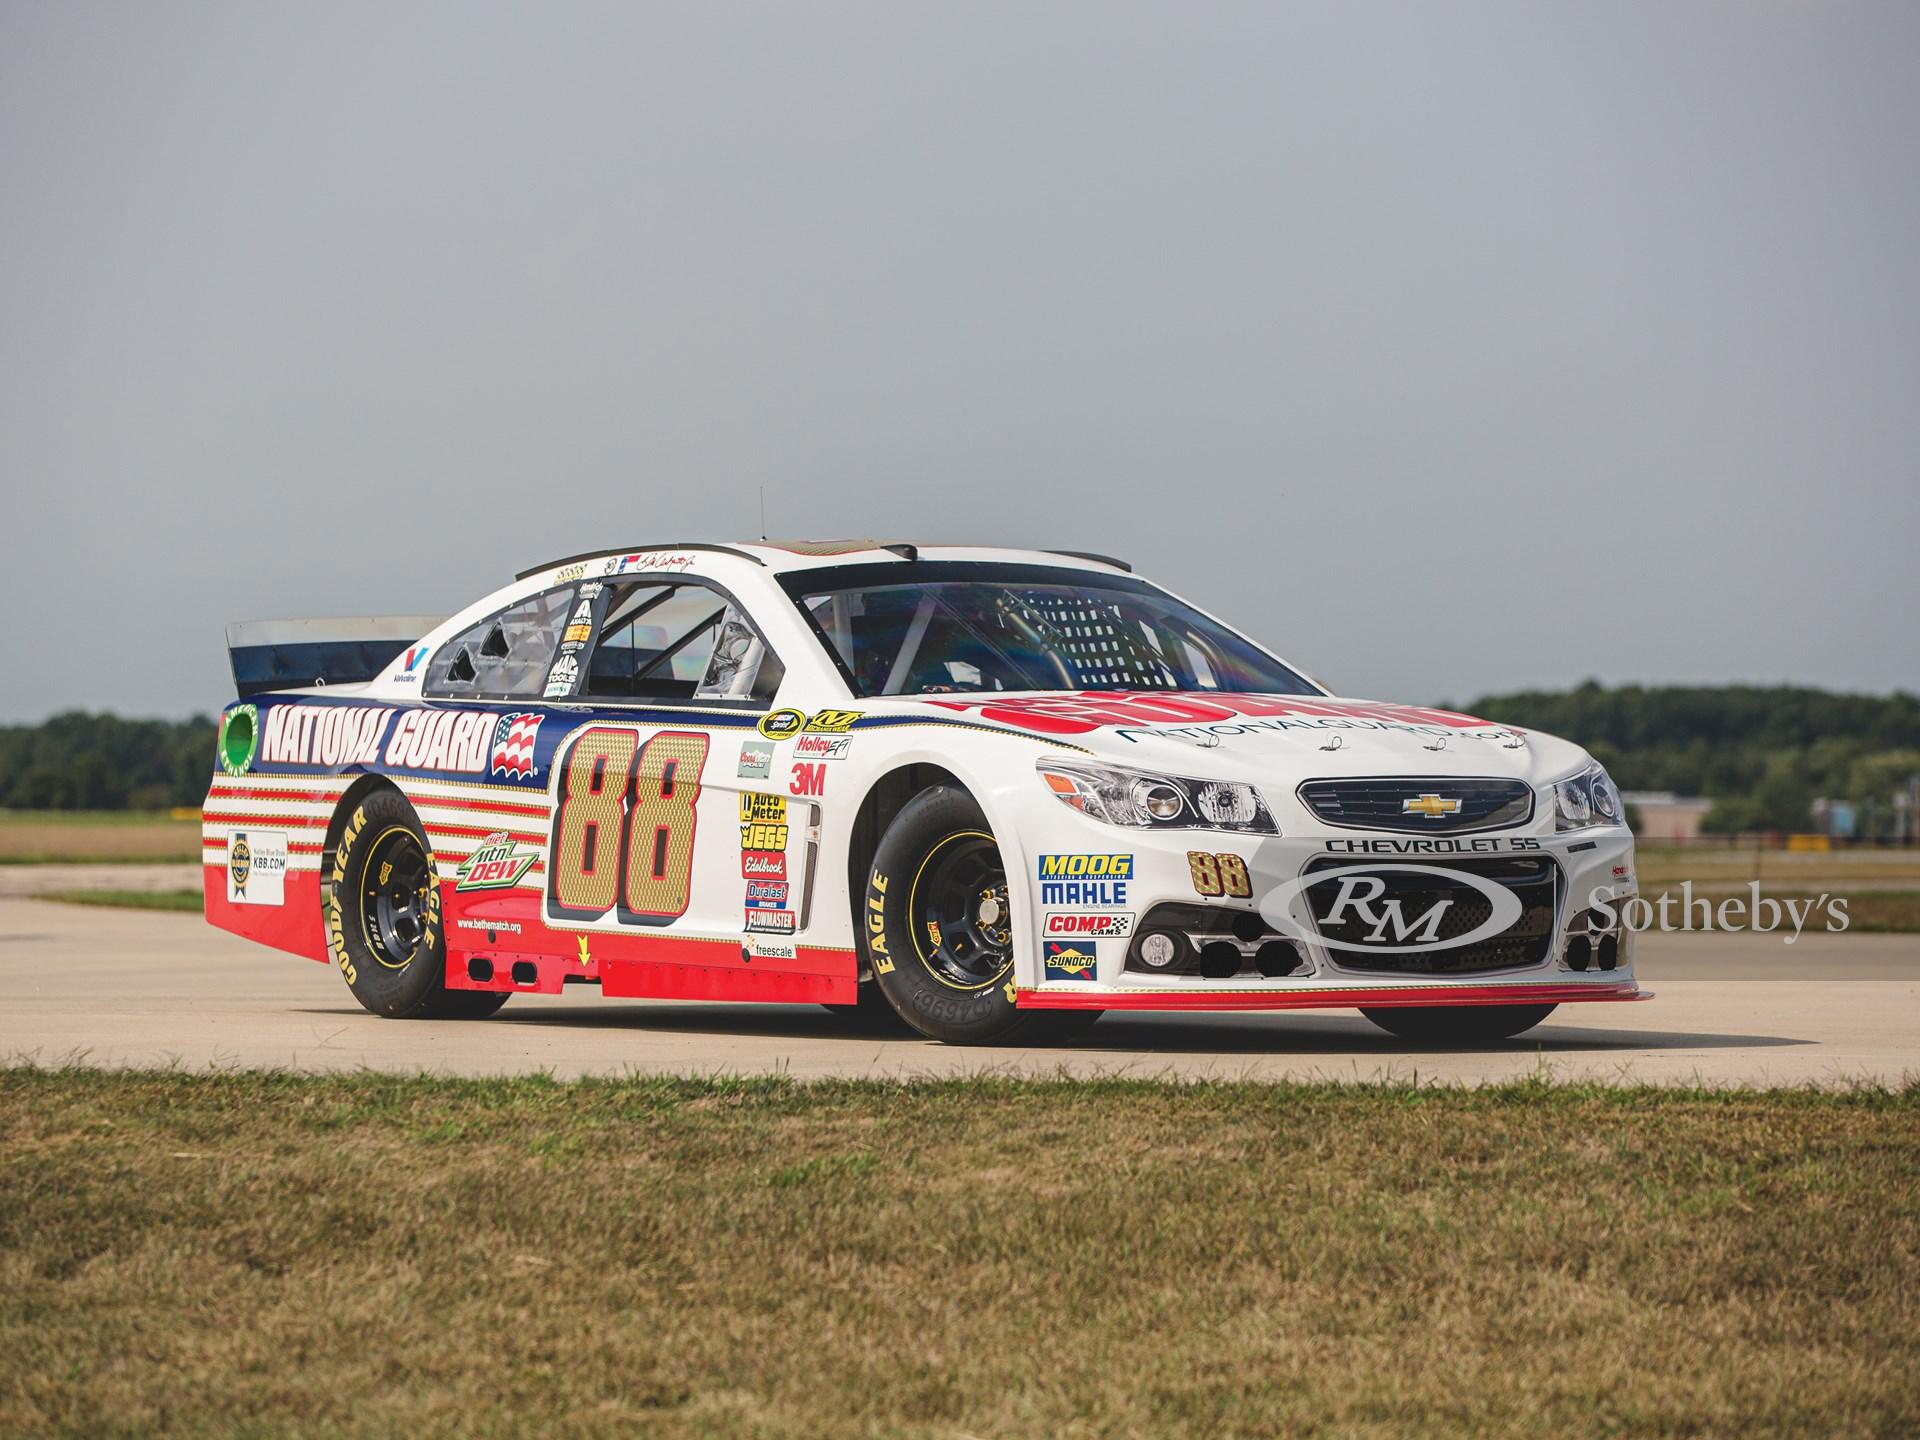 2012 Chevrolet Impala NASCAR 'Dale Earnhardt Jr.'  -